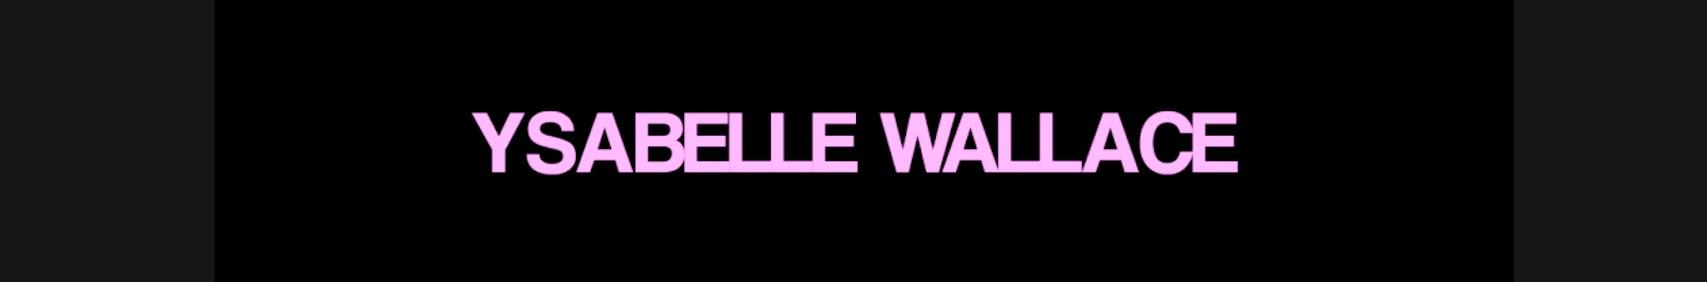 ysabelle wallace